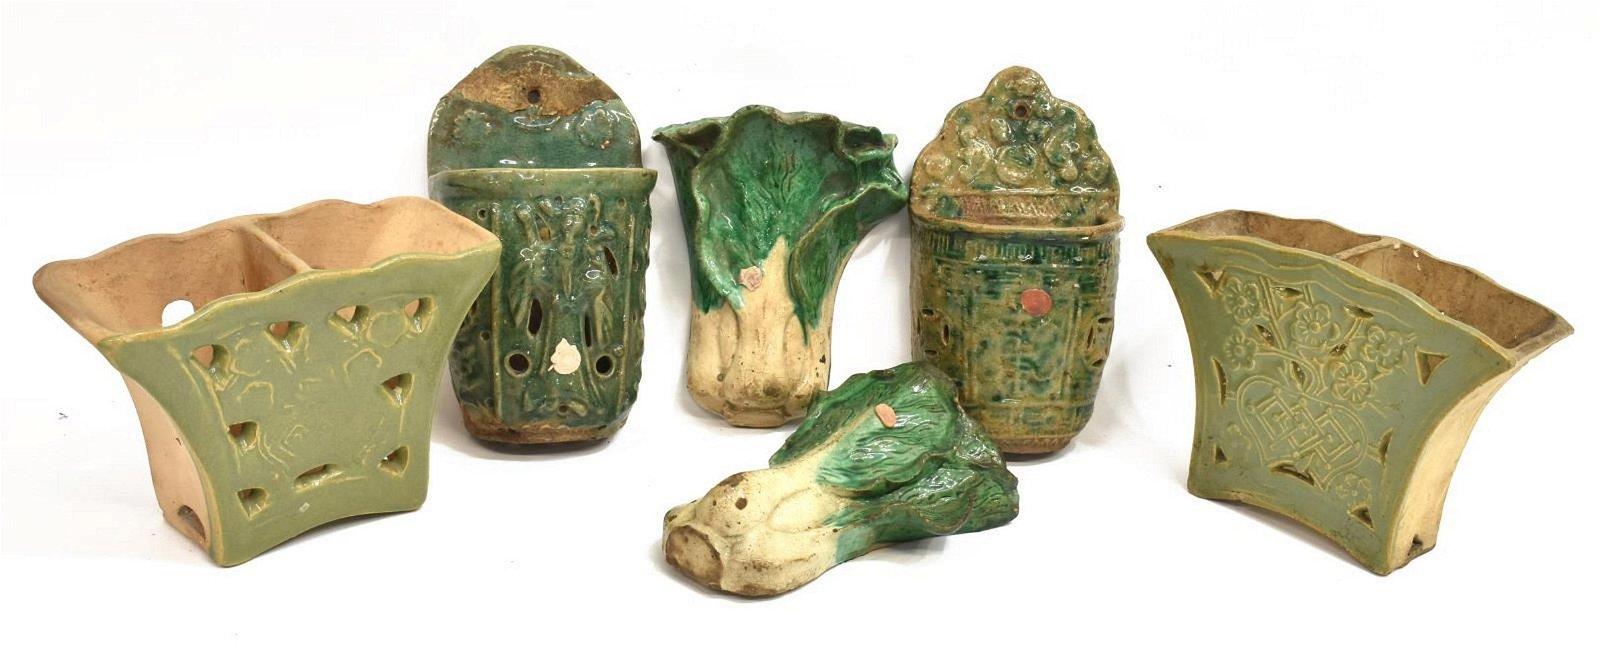 (6) CHINESE GREEN GLAZED CERAMIC WALL POCKETS